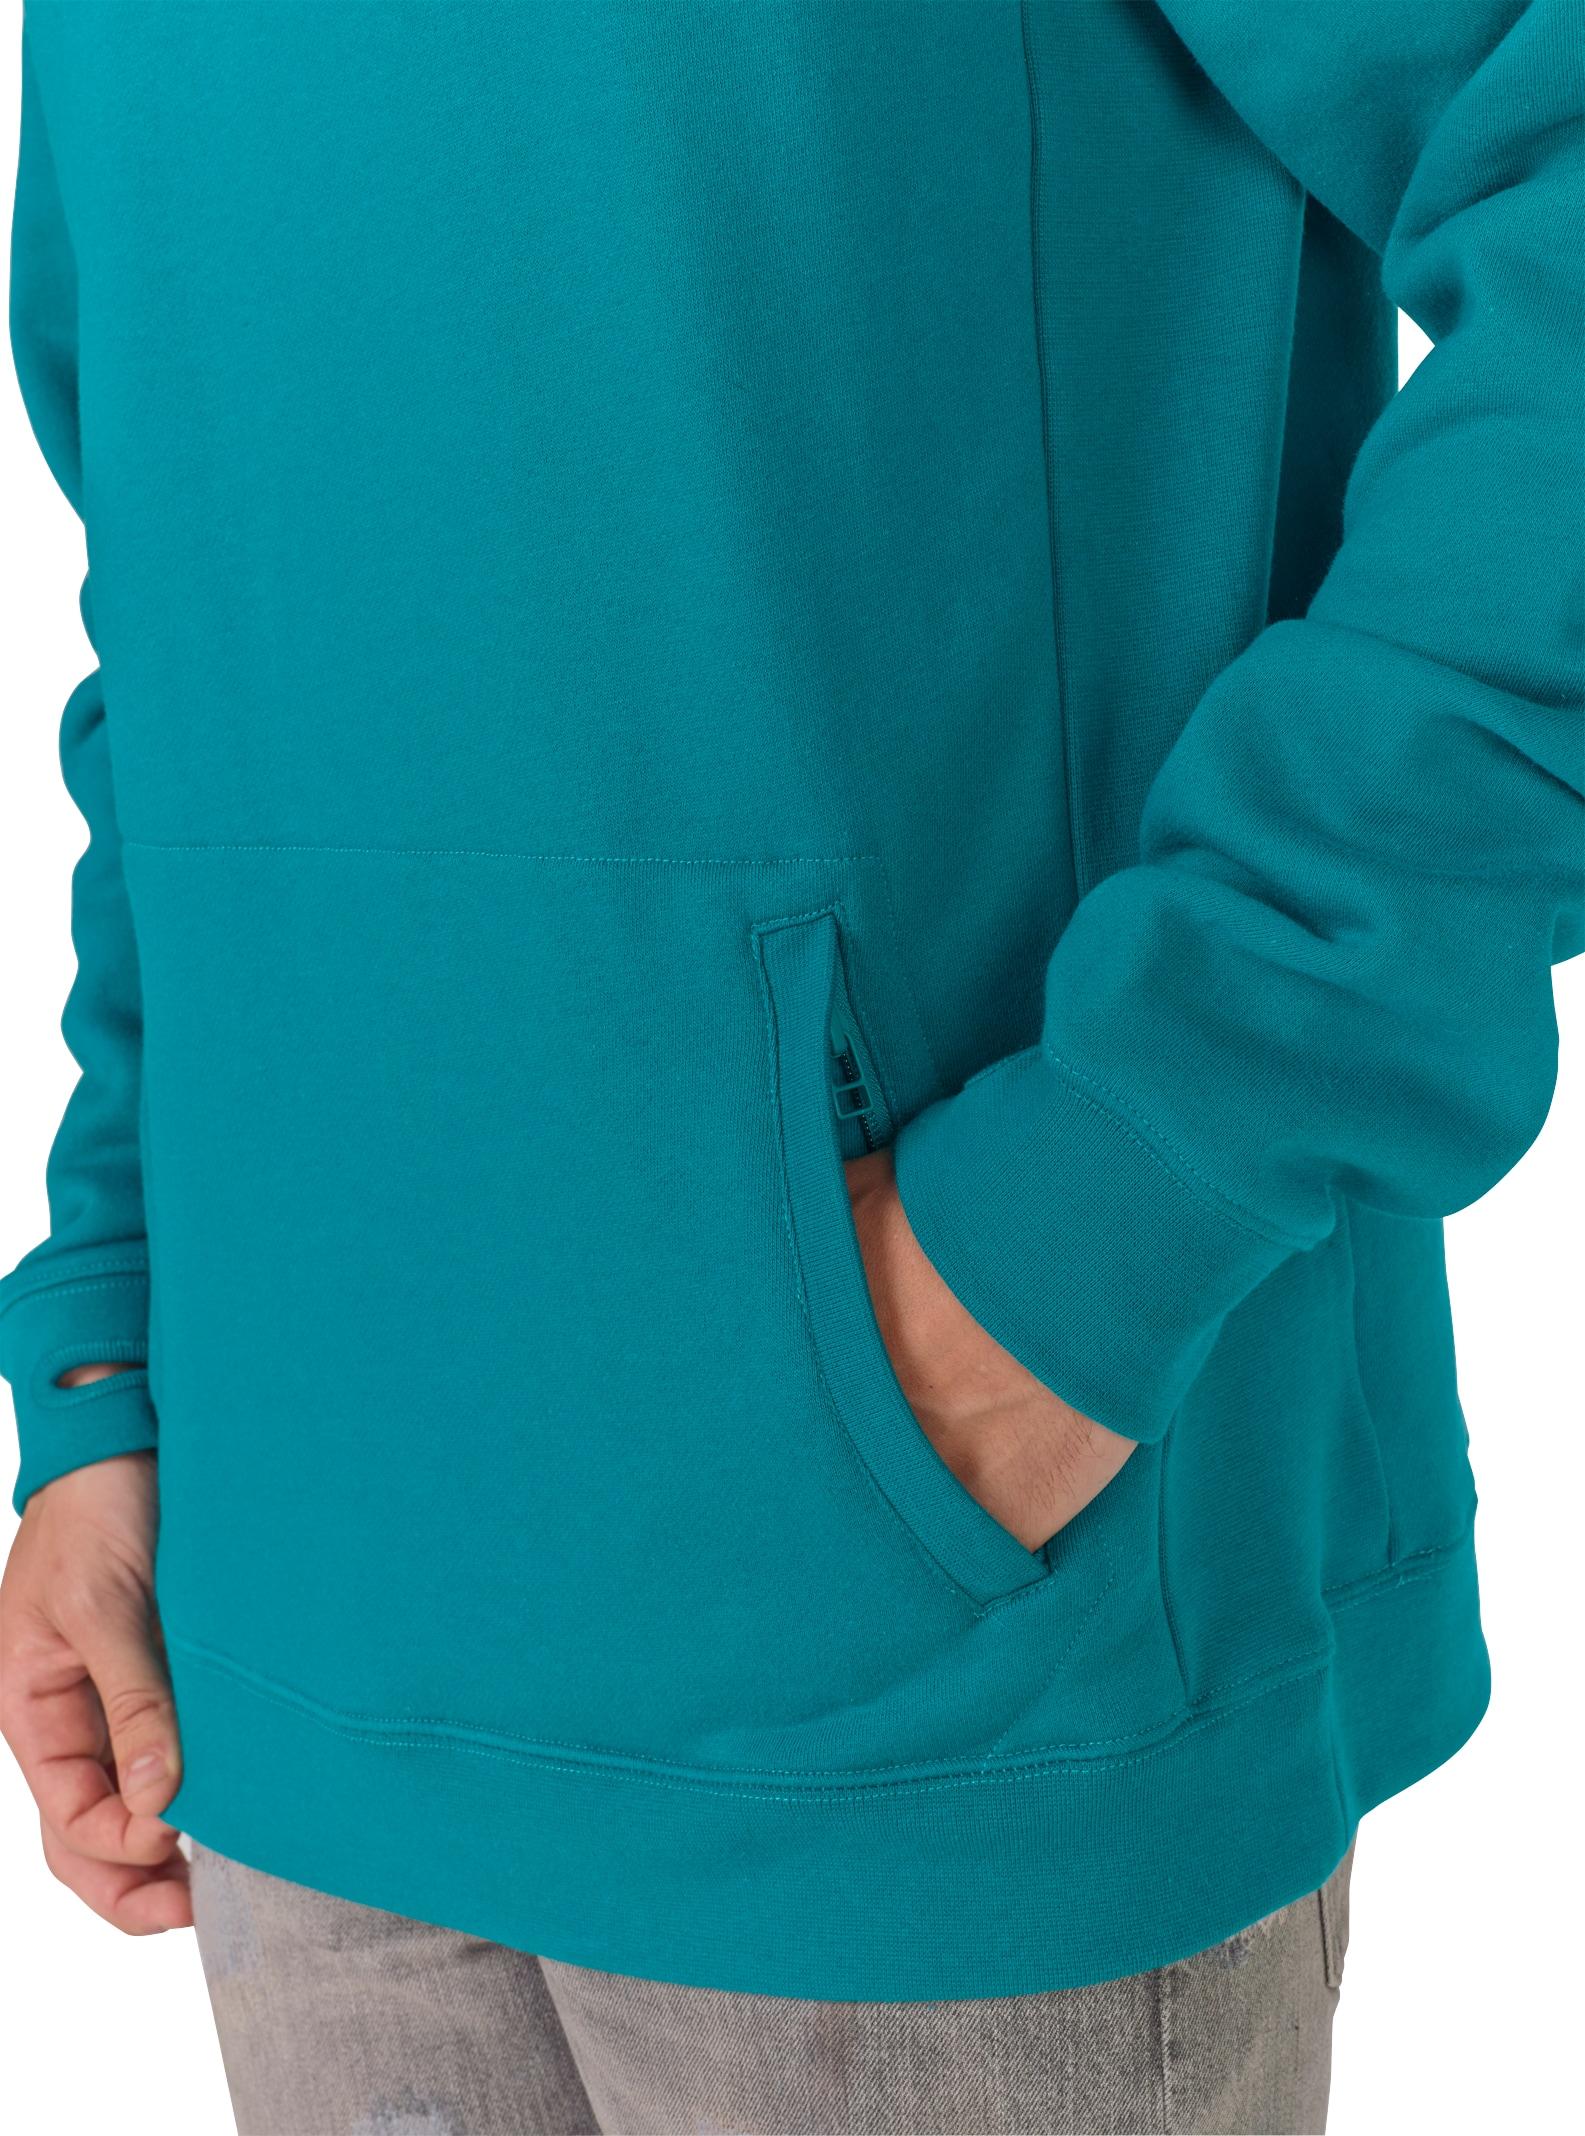 Snowboard Fleece Jacke ANALOG ENCLAVE Sweater 2018 blue 107 Pullover